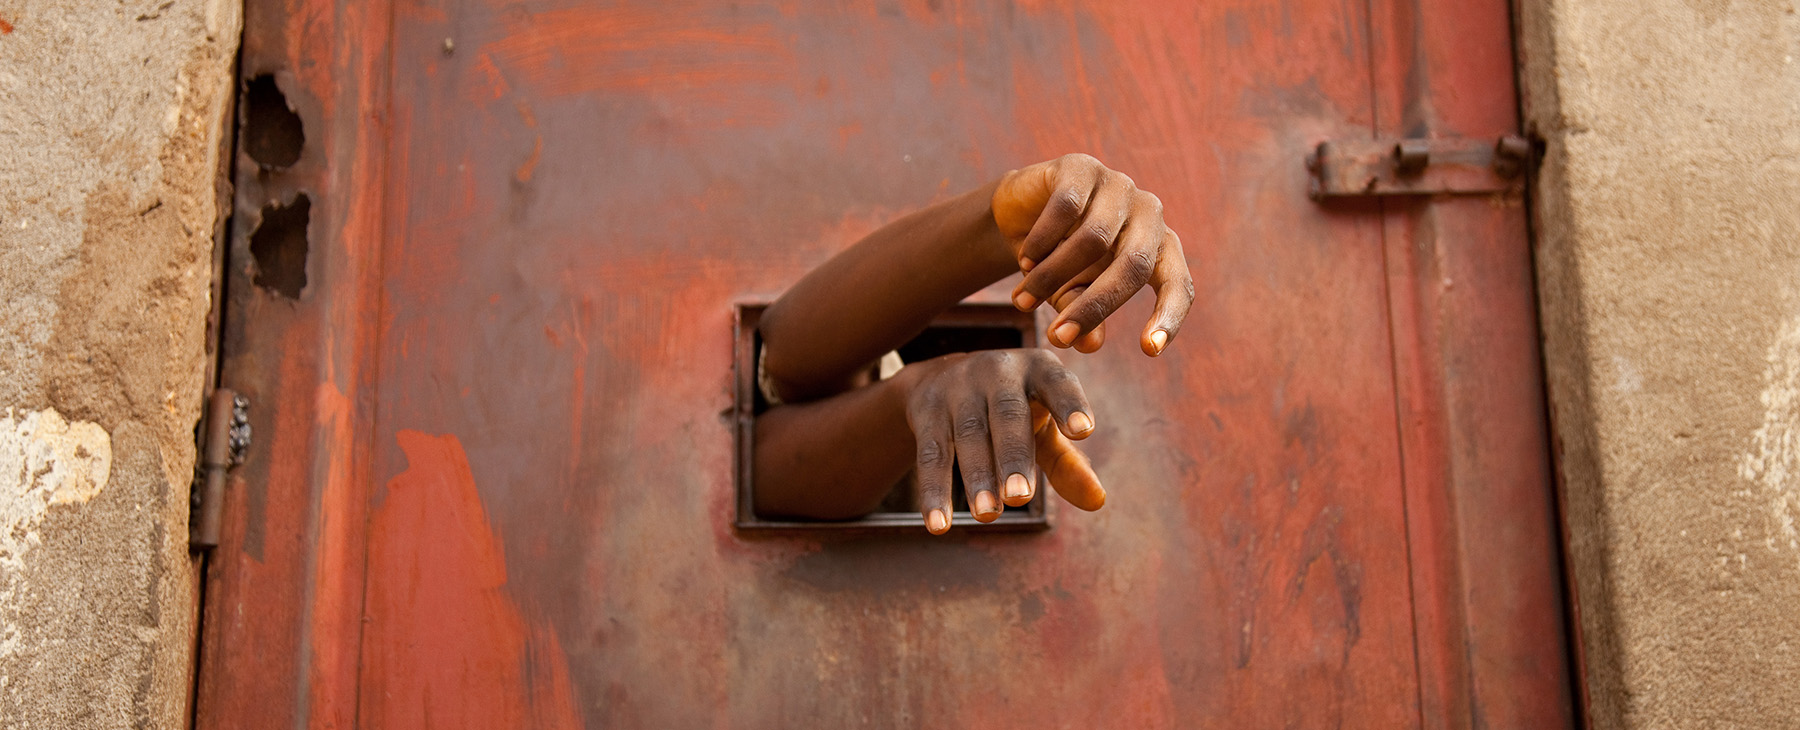 Burundi: End impunity for crimes of torture